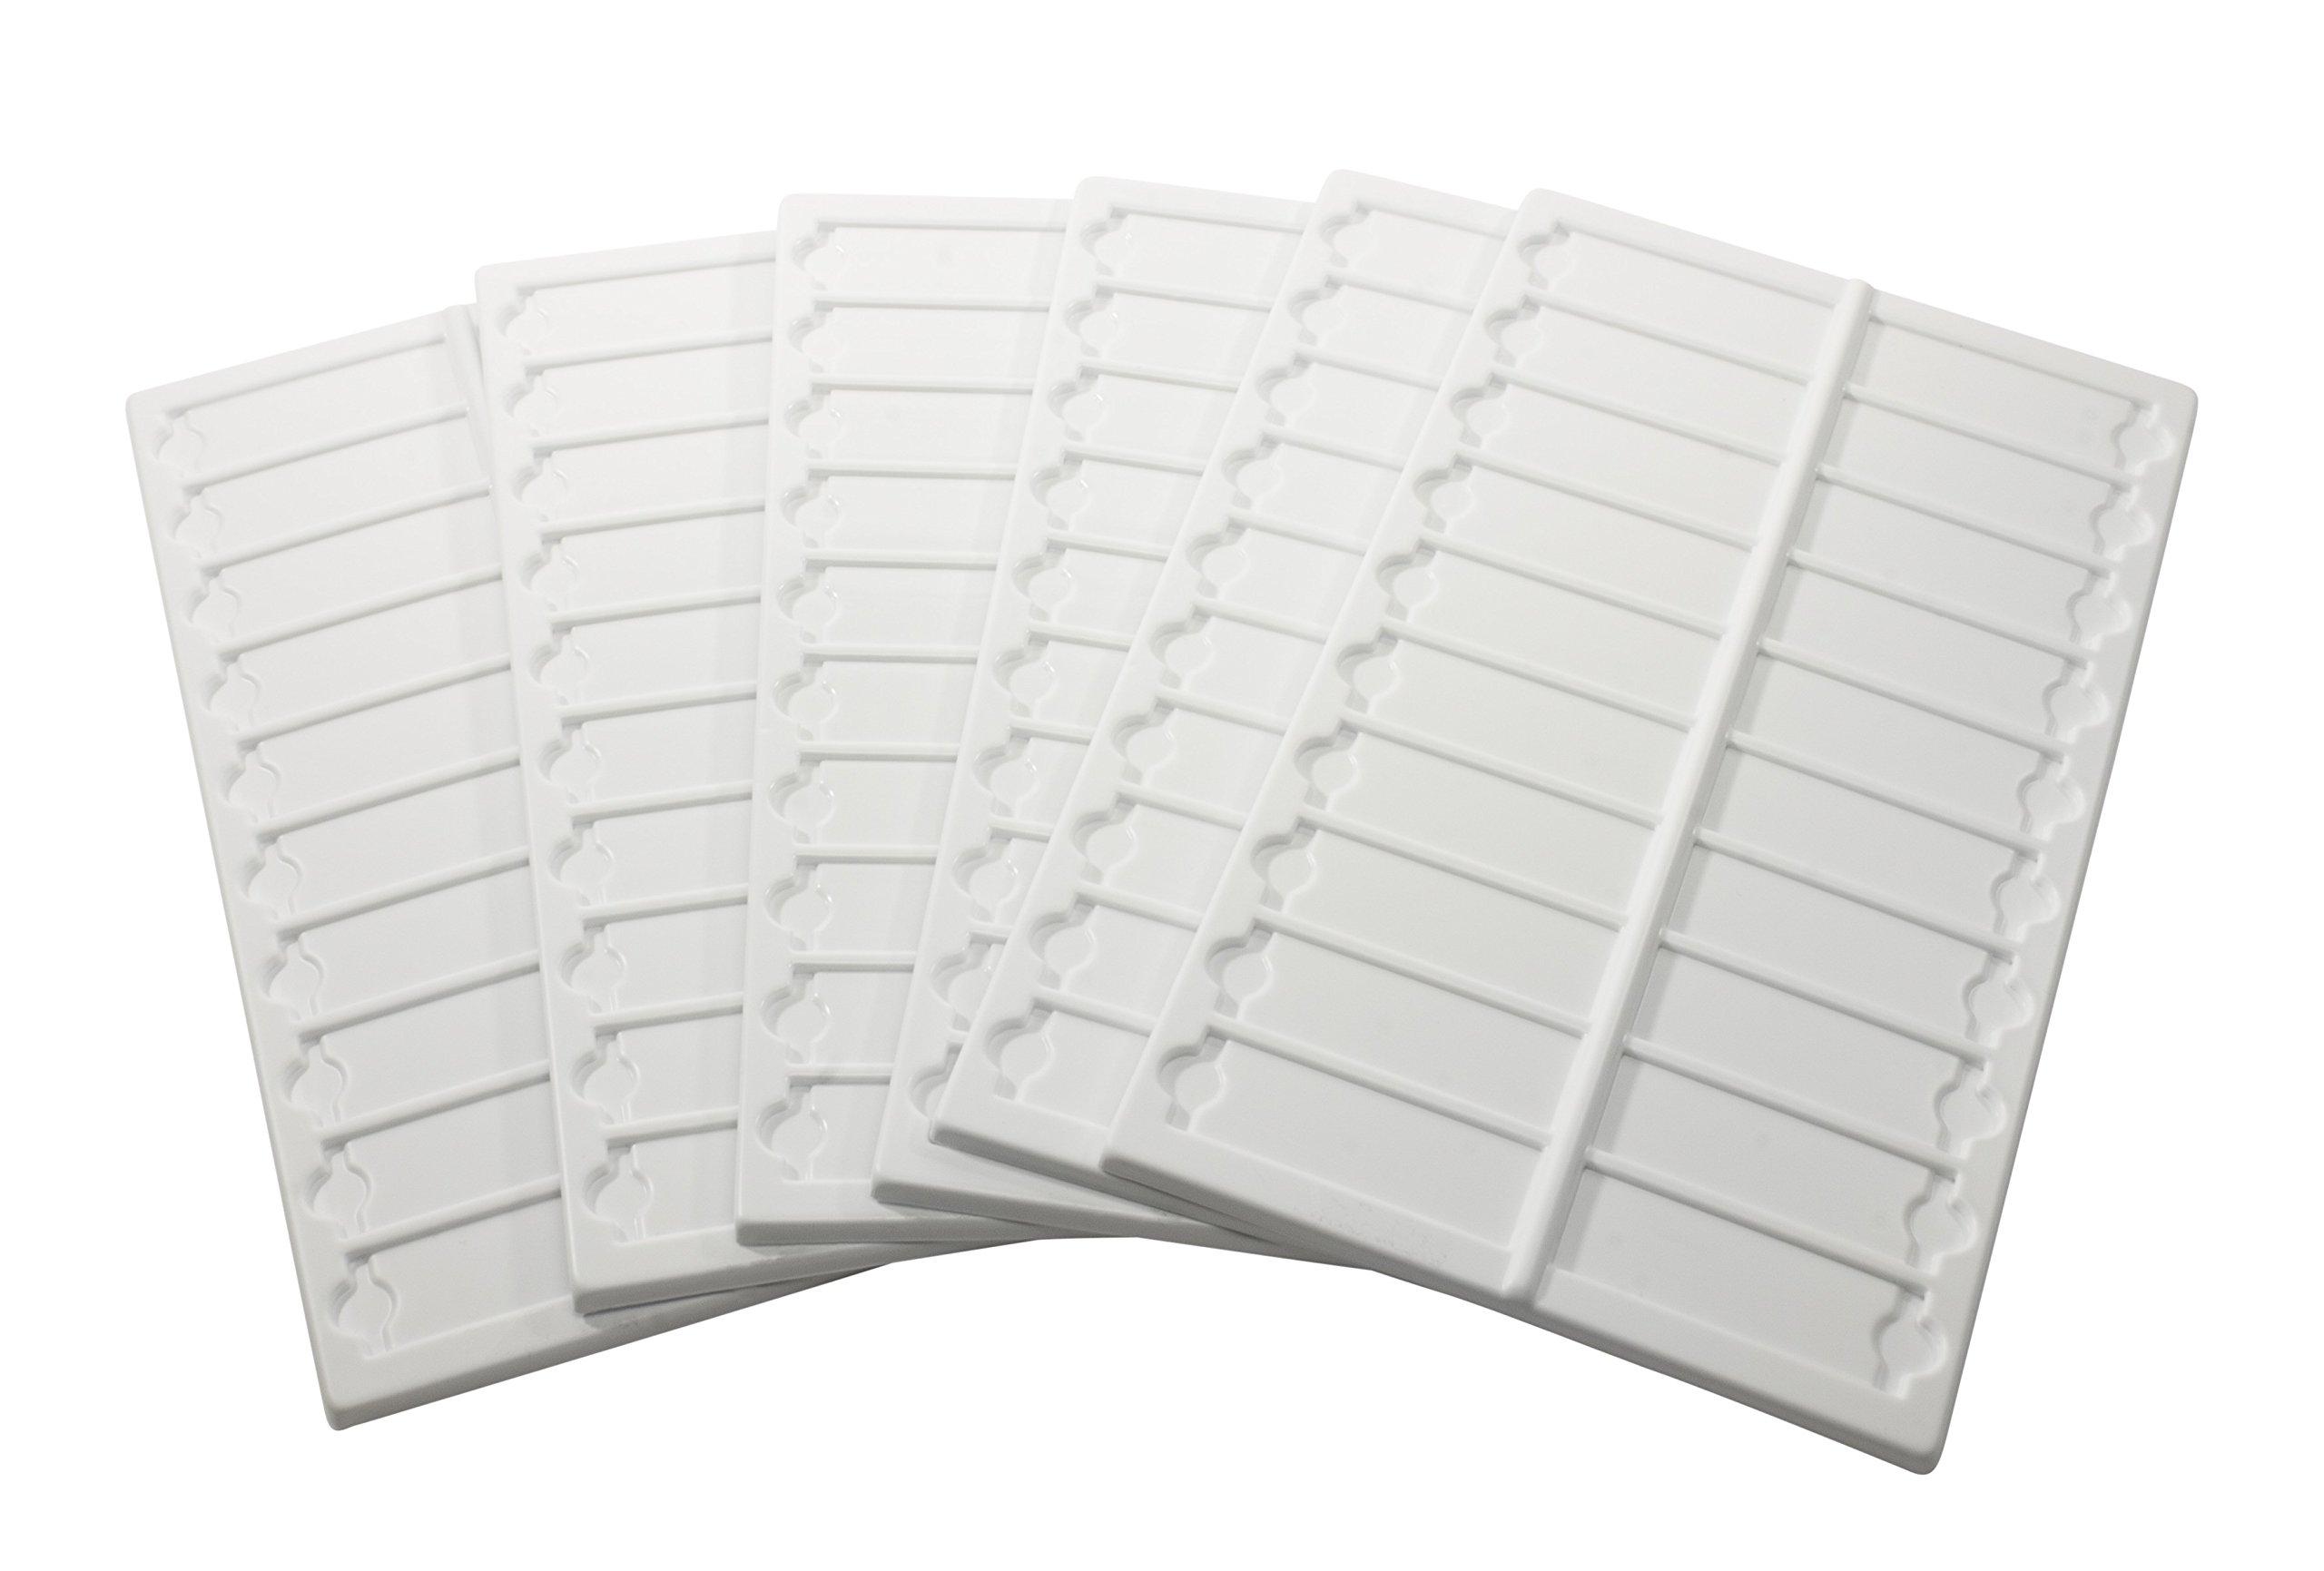 Bel-Art Microscope Slide Tray; 20 Capacity, 13½ x 6 ⅝ in, Plastic (Pack of 6) (H44581-0000)